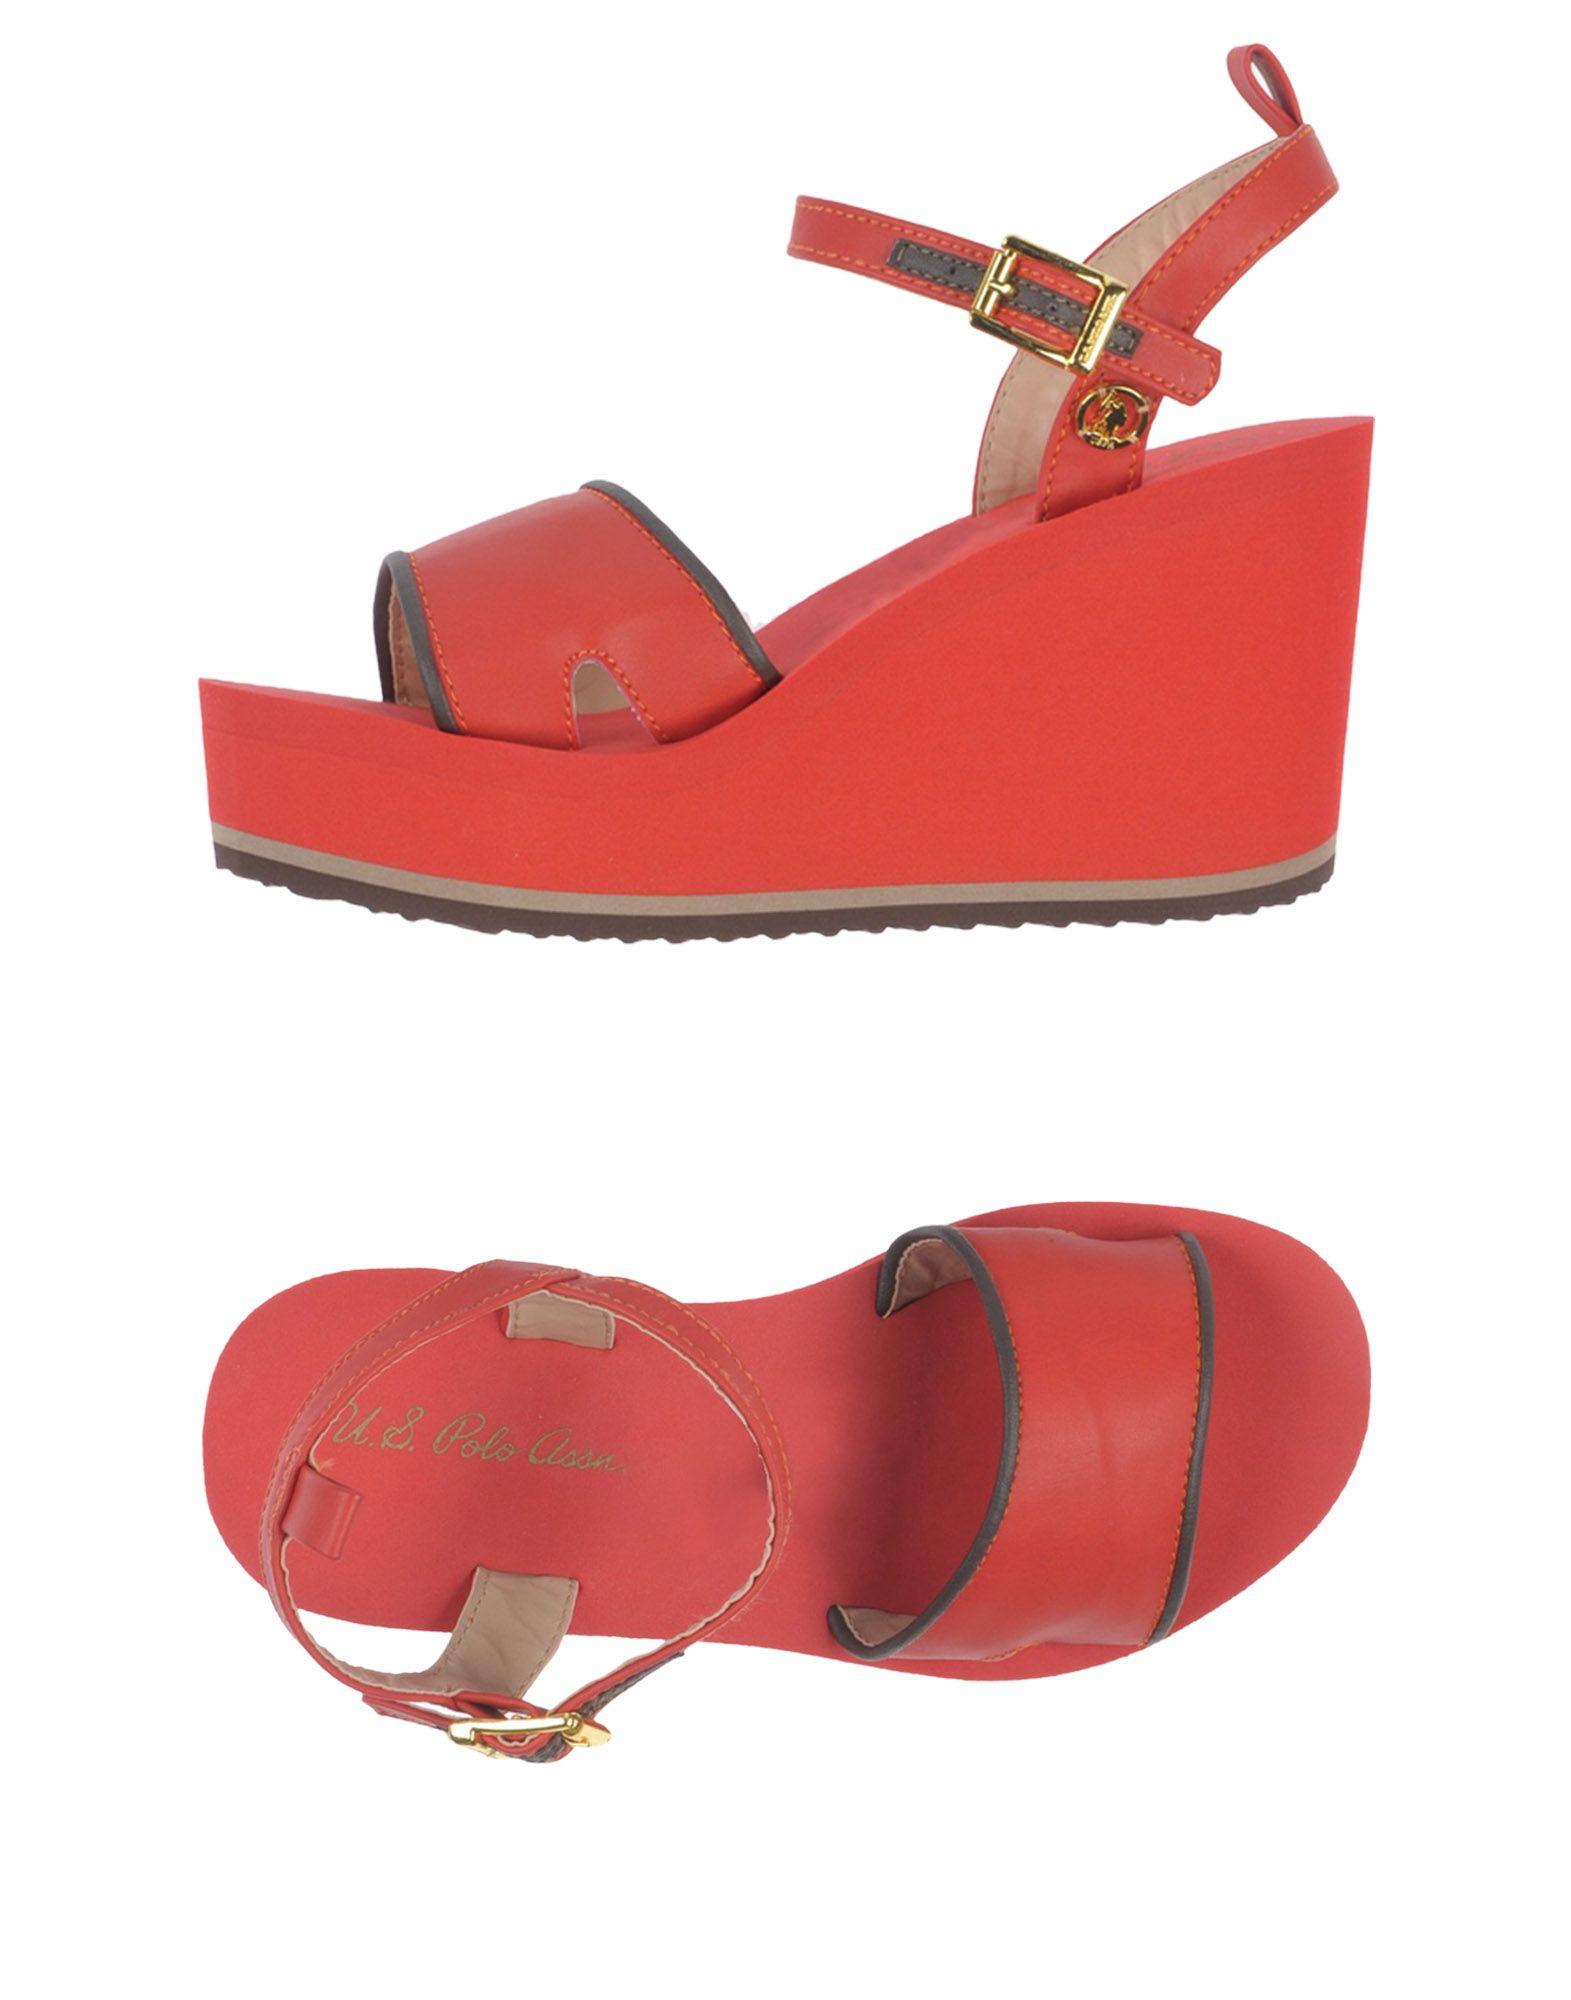 FOOTWEAR - Slippers on YOOX.COM U.S.Polo Association xv9oj71j8H